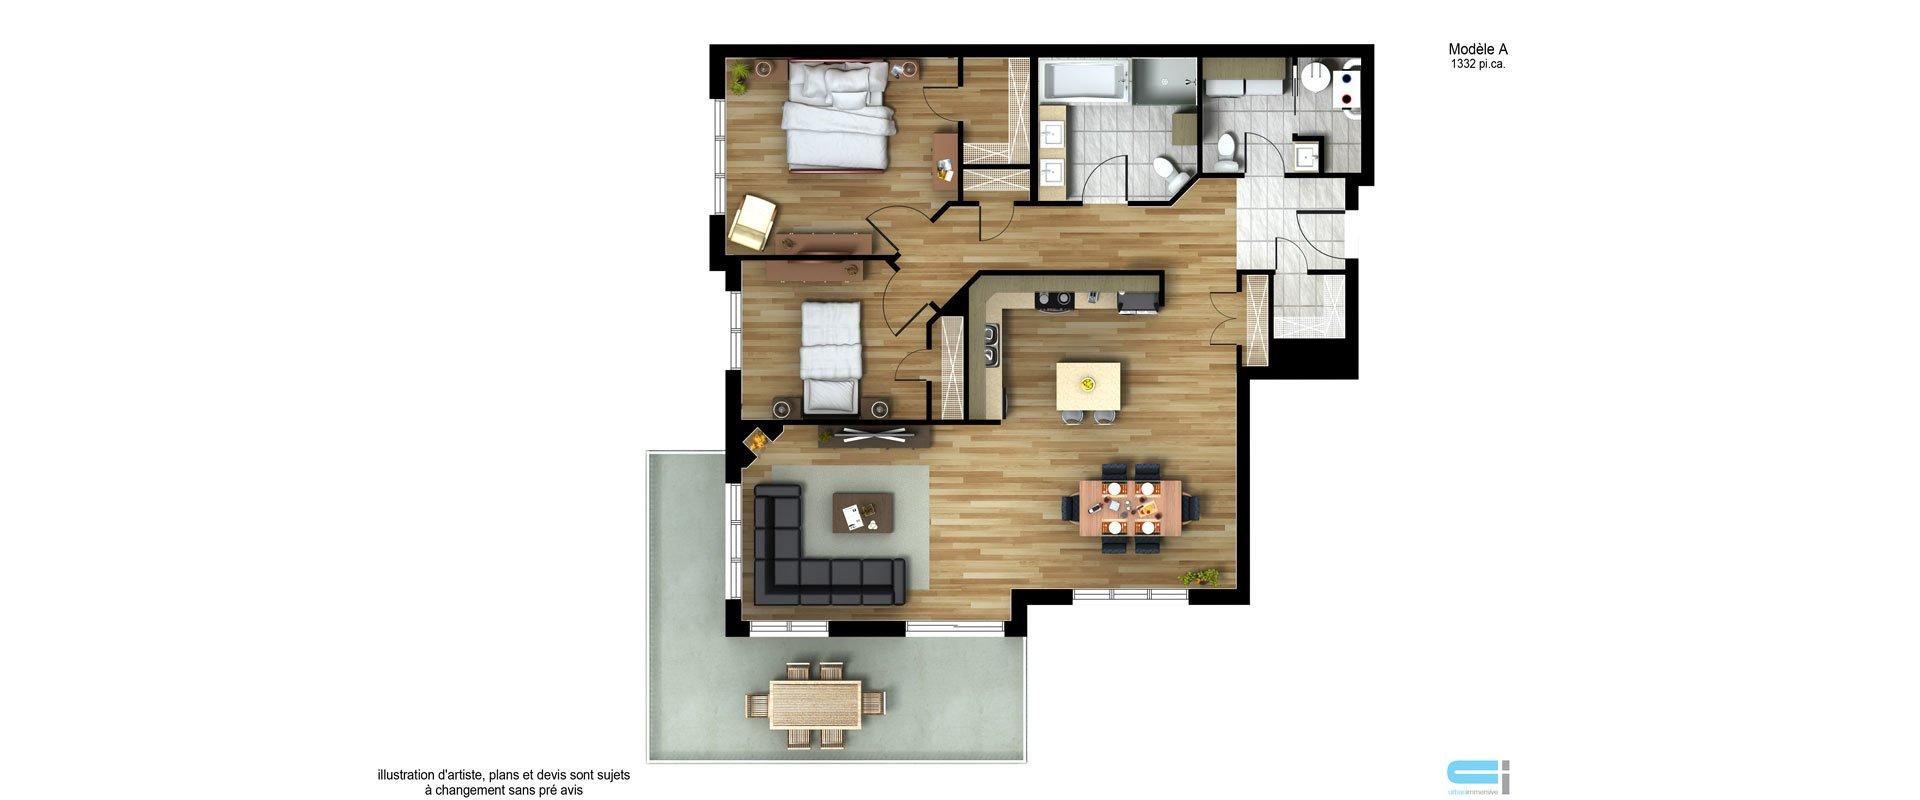 Les Habitations Innovatel condos neufs X15 Mirabel modèle A